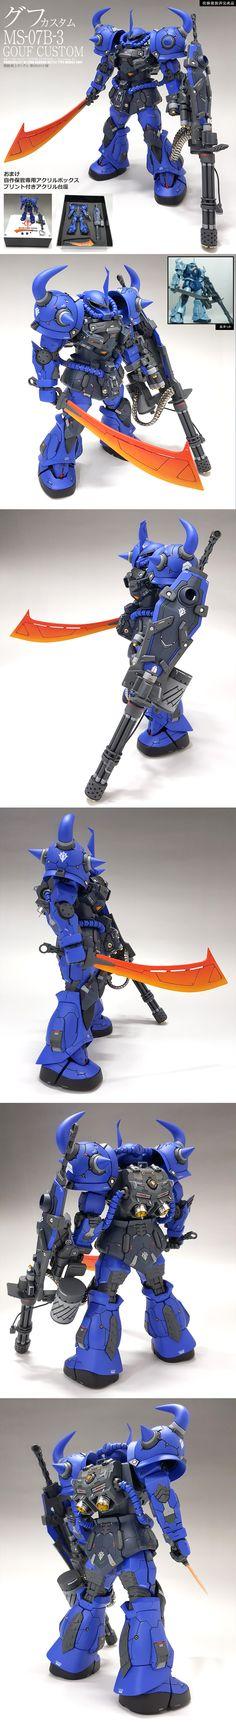 Check out the latest Gunpla Gundam News here. Gundam Tutorial, Barbatos Lupus, Gundam Toys, Gundam Mobile Suit, Gundam Custom Build, Cool Robots, Gundam Seed, Frame Arms, Gunpla Custom